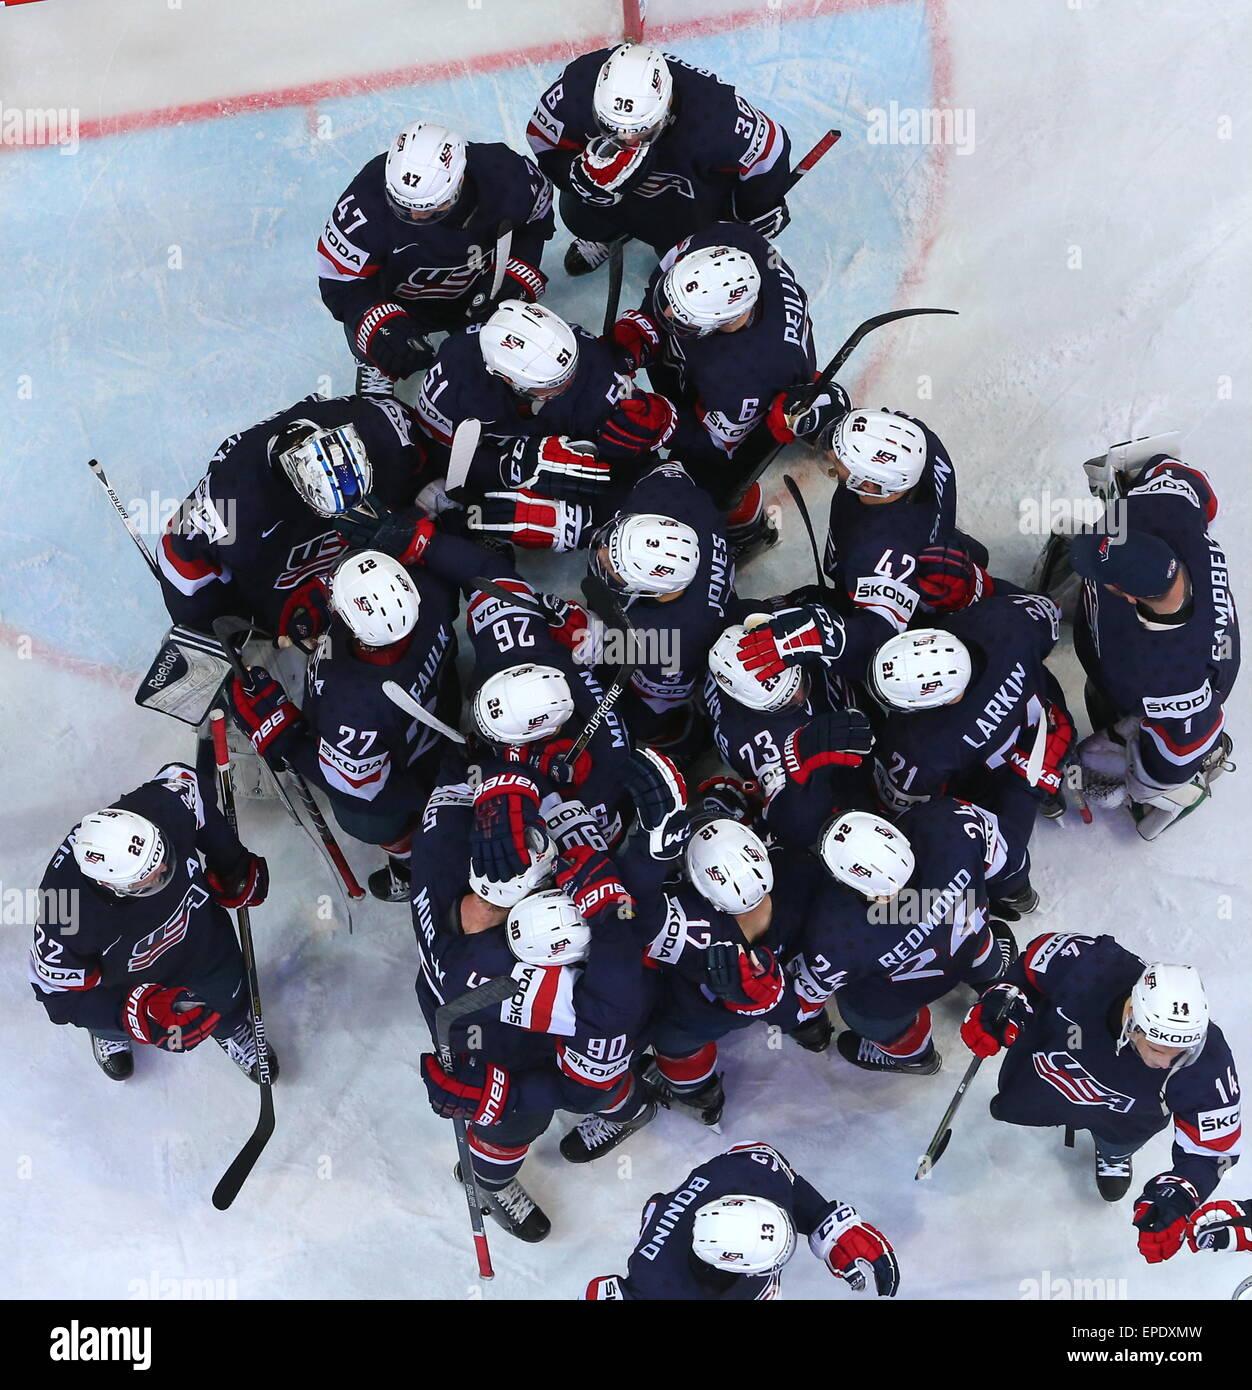 Fahne Banner 2015 Ice Hockey World Championship Czech Republic Prag Ostarva # 27 Memorabilia Sammeln & Seltenes